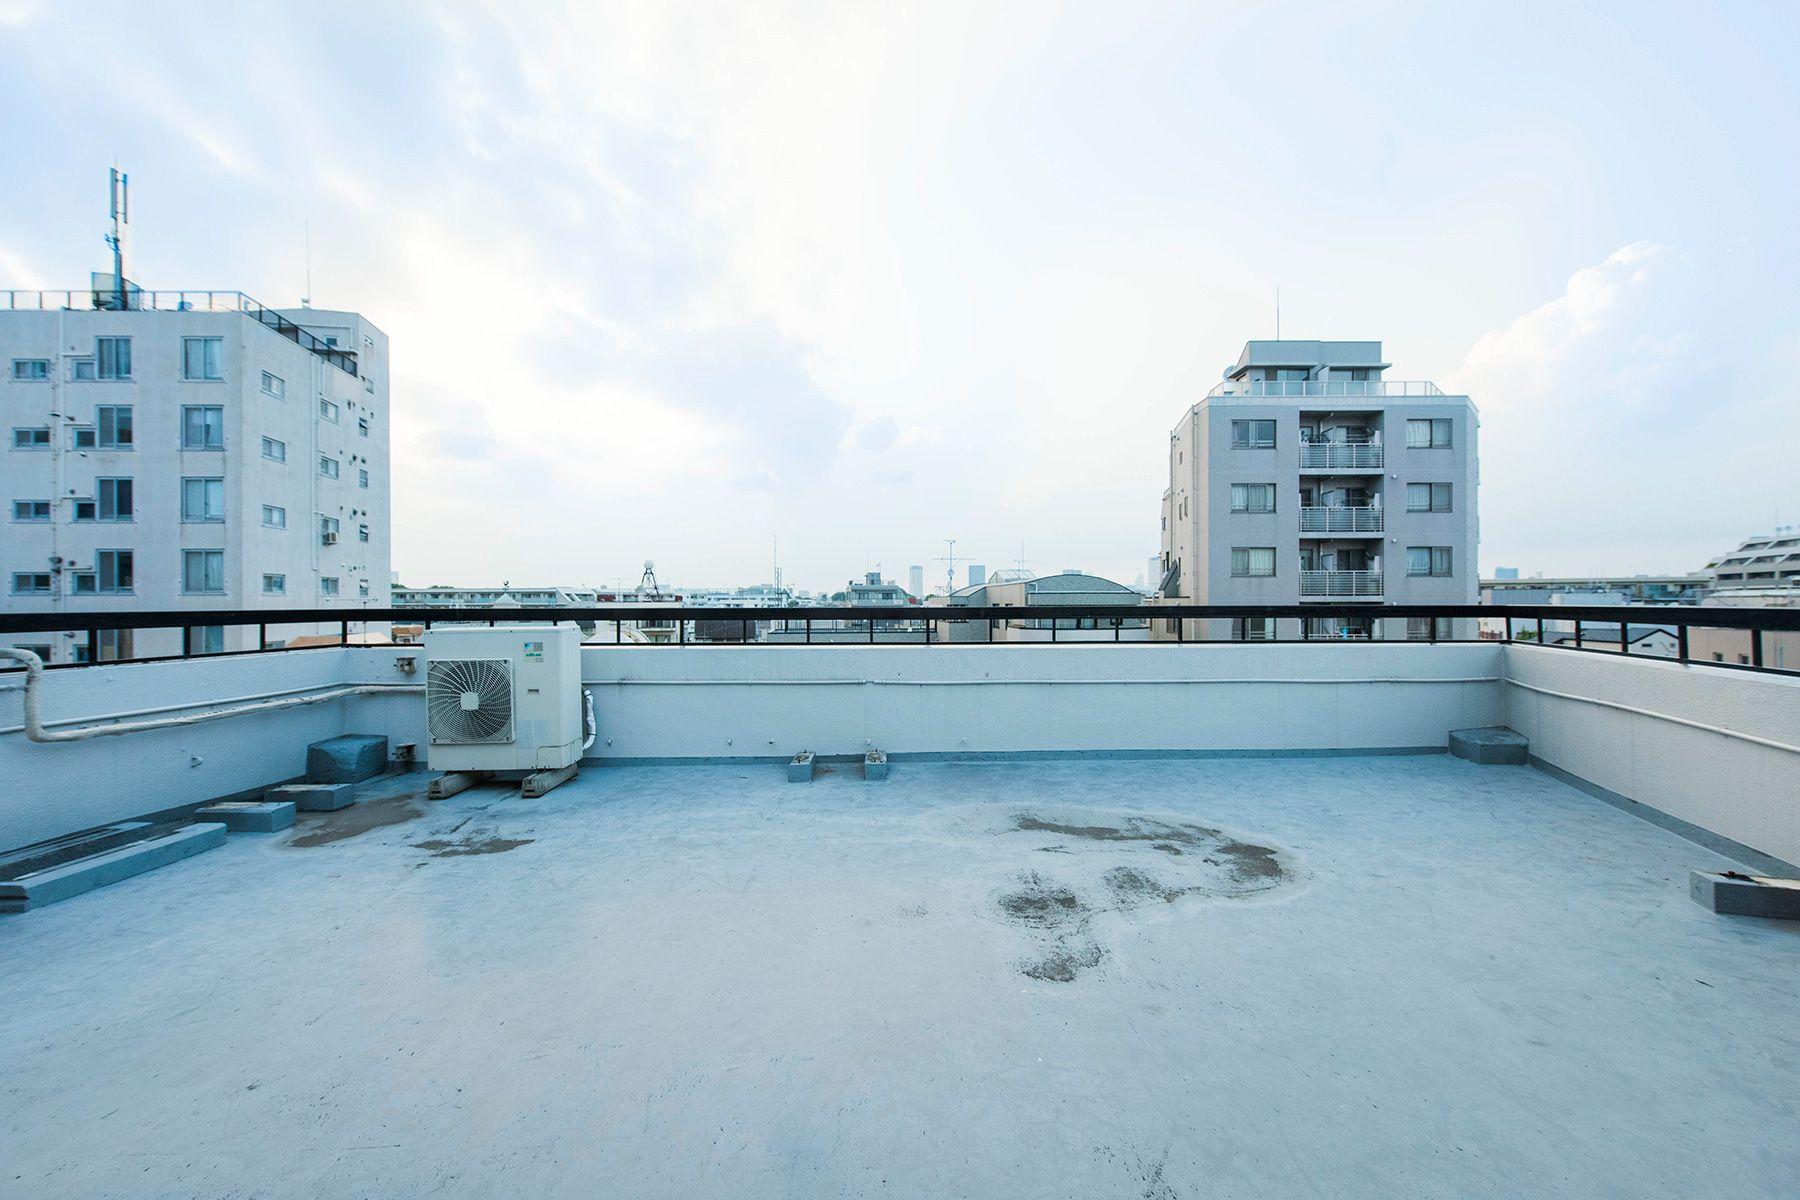 3rd floor(サードフロア)option 屋上